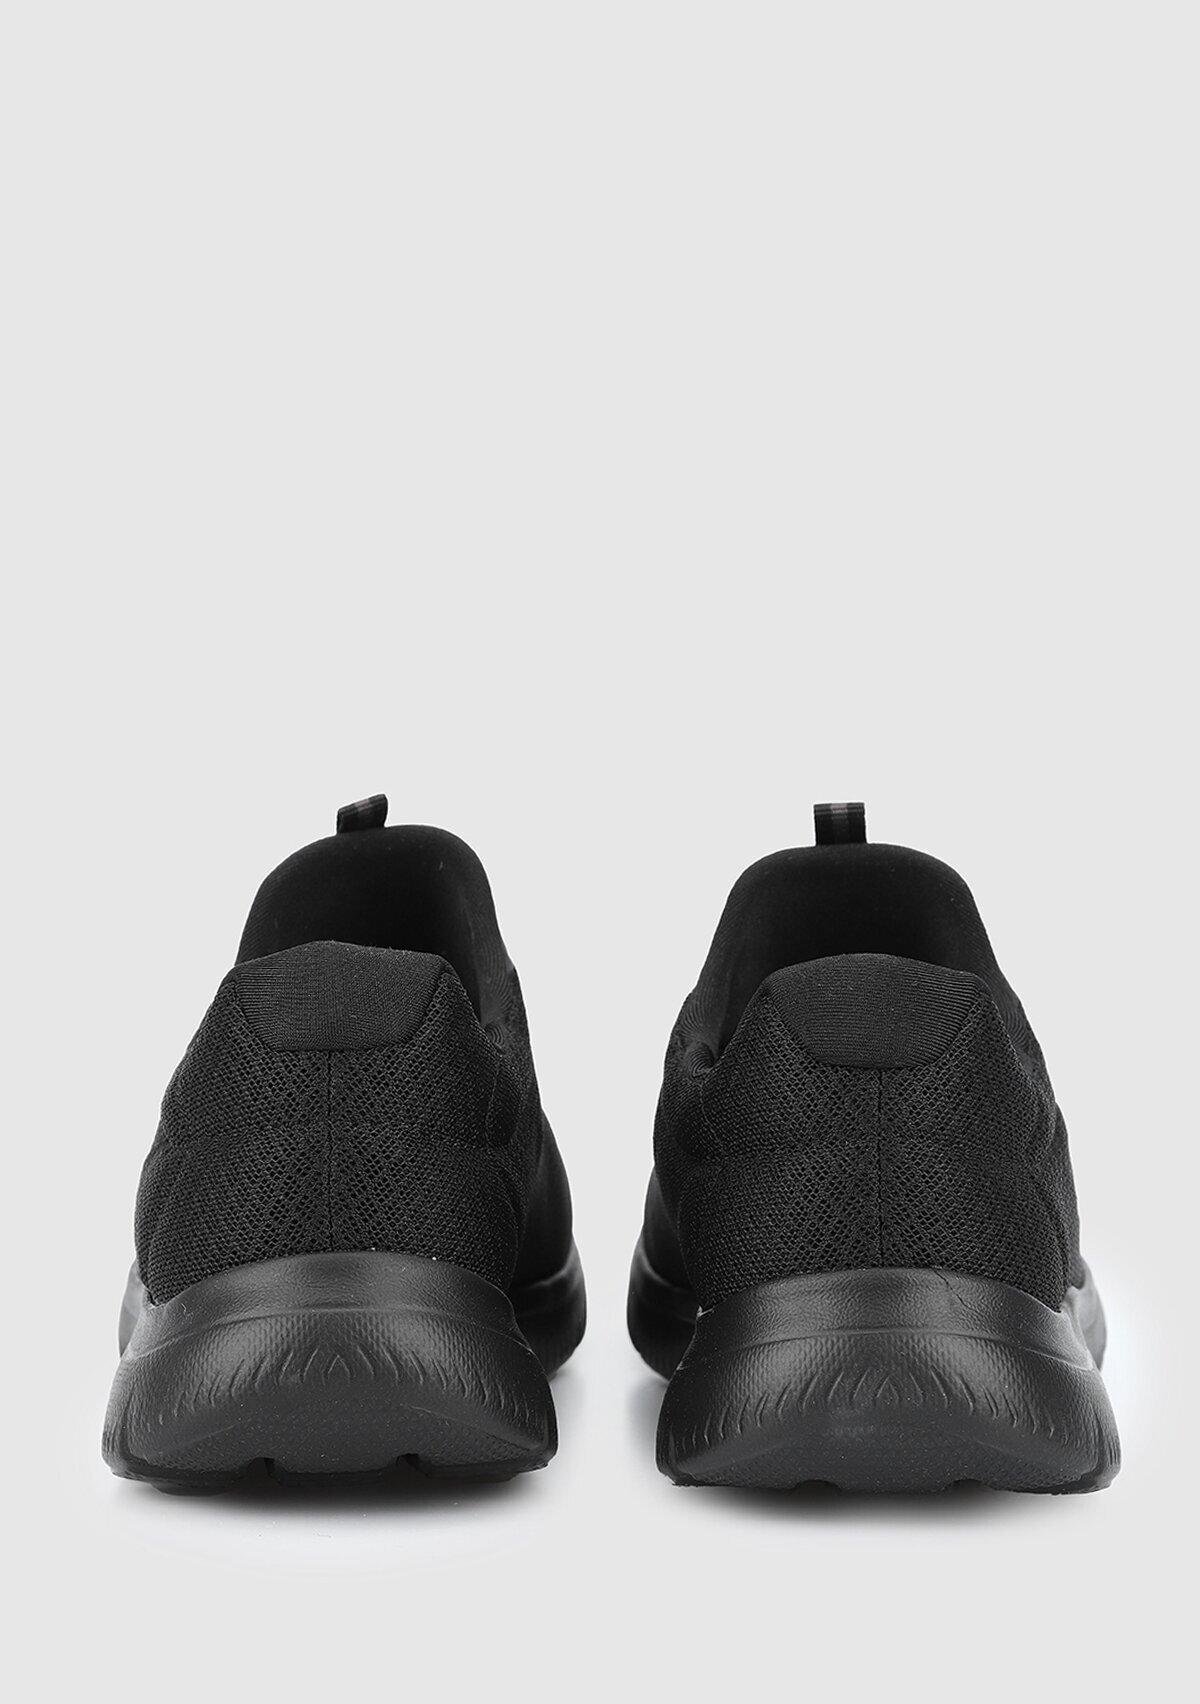 resm Summits Siyah Kadın Sneaker 12980Bbk